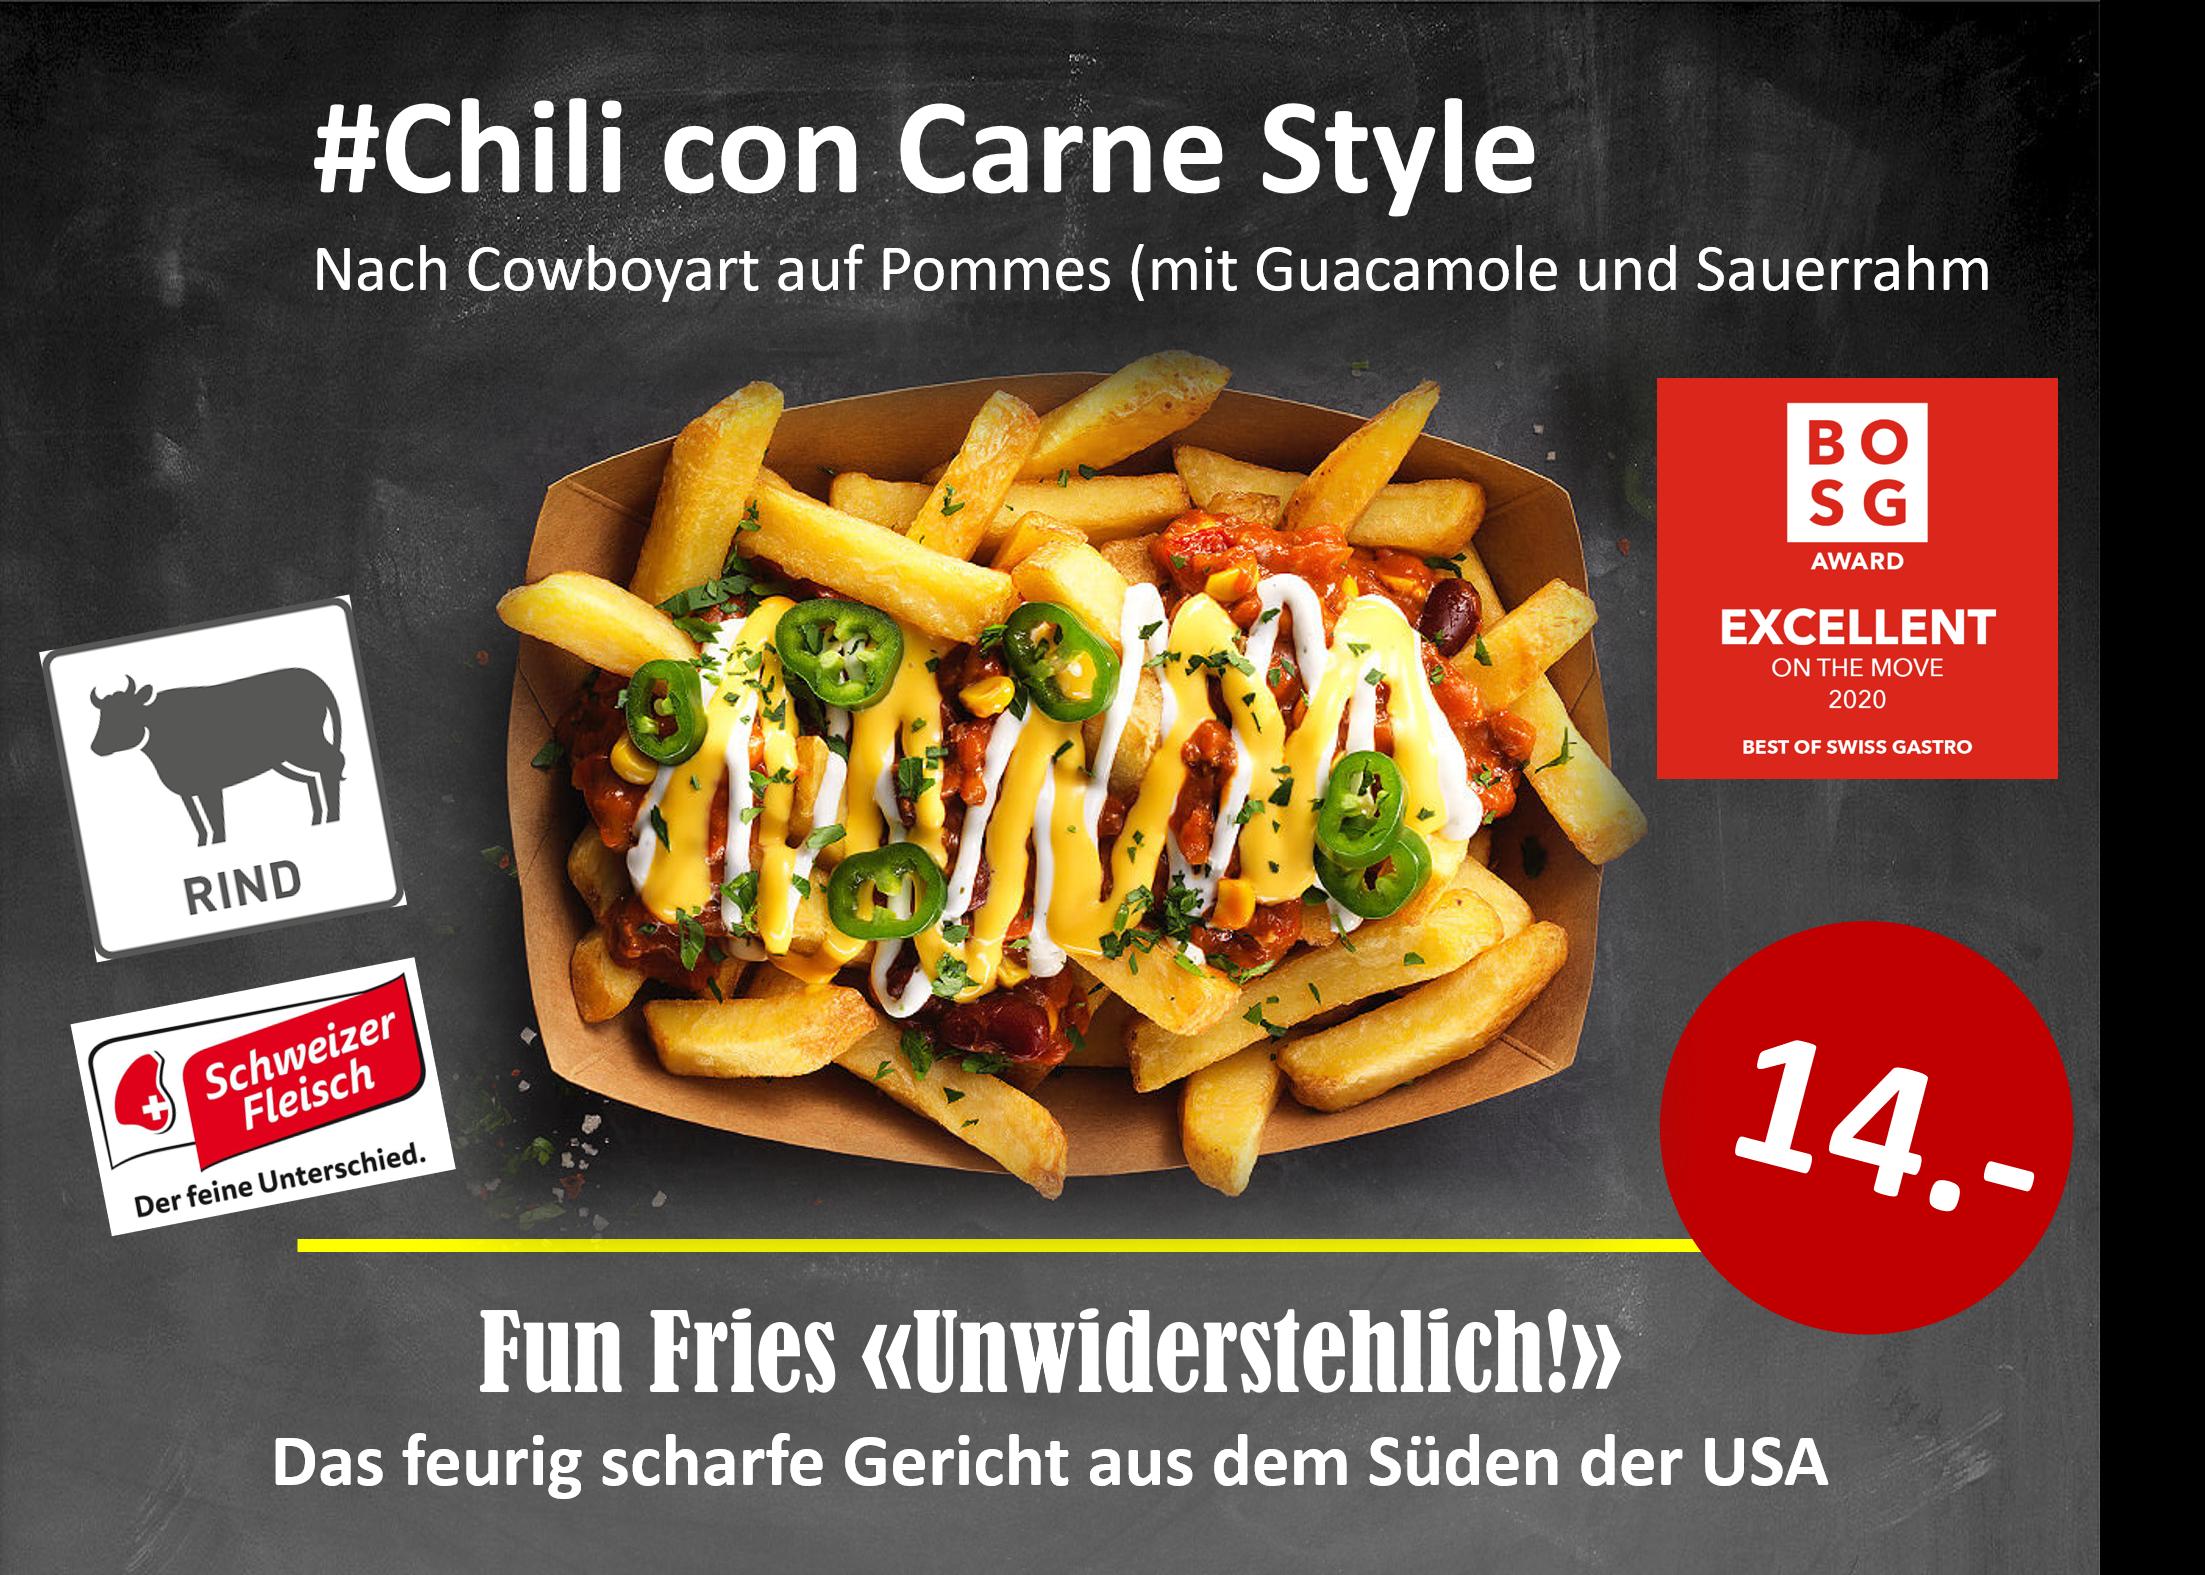 #ChiliconCarne Style, nach Cowboyart